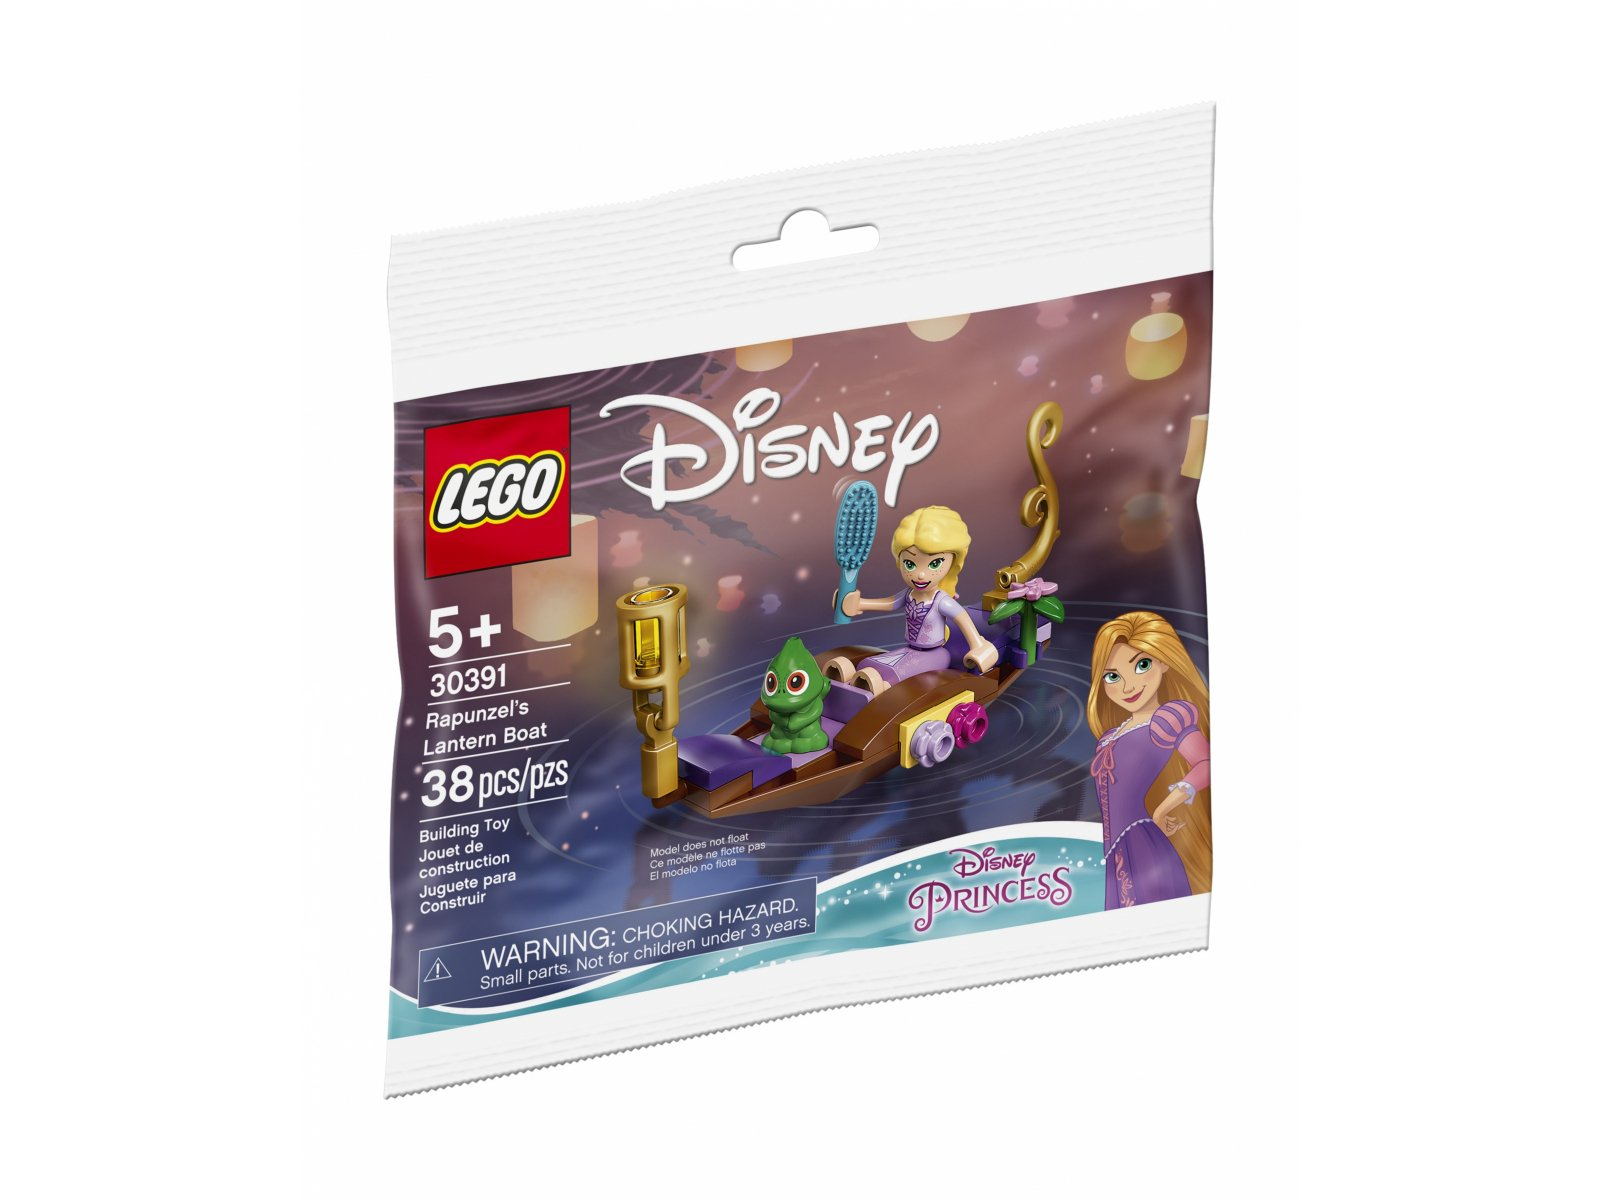 LEGO 30391 Disney Łódka Roszpunki z latarnią